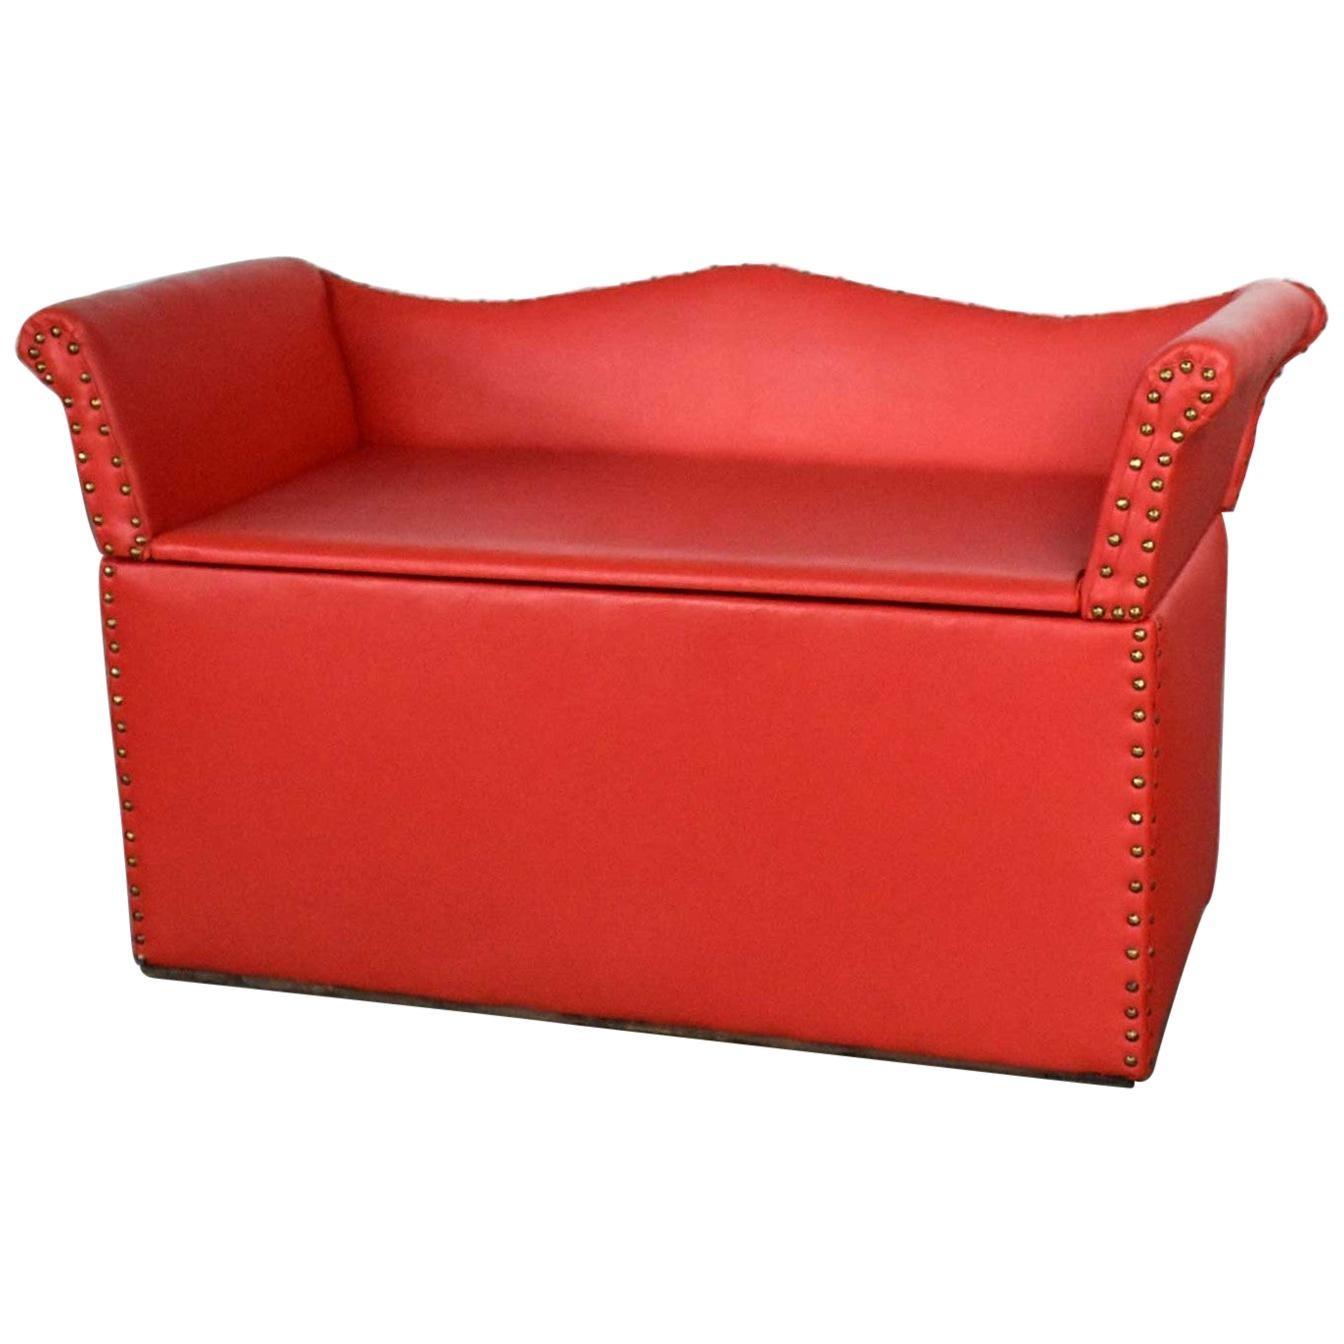 Vintage Coral Vinyl Faux Leather Cedar Lined Storage Bench Settee Nailhead Det